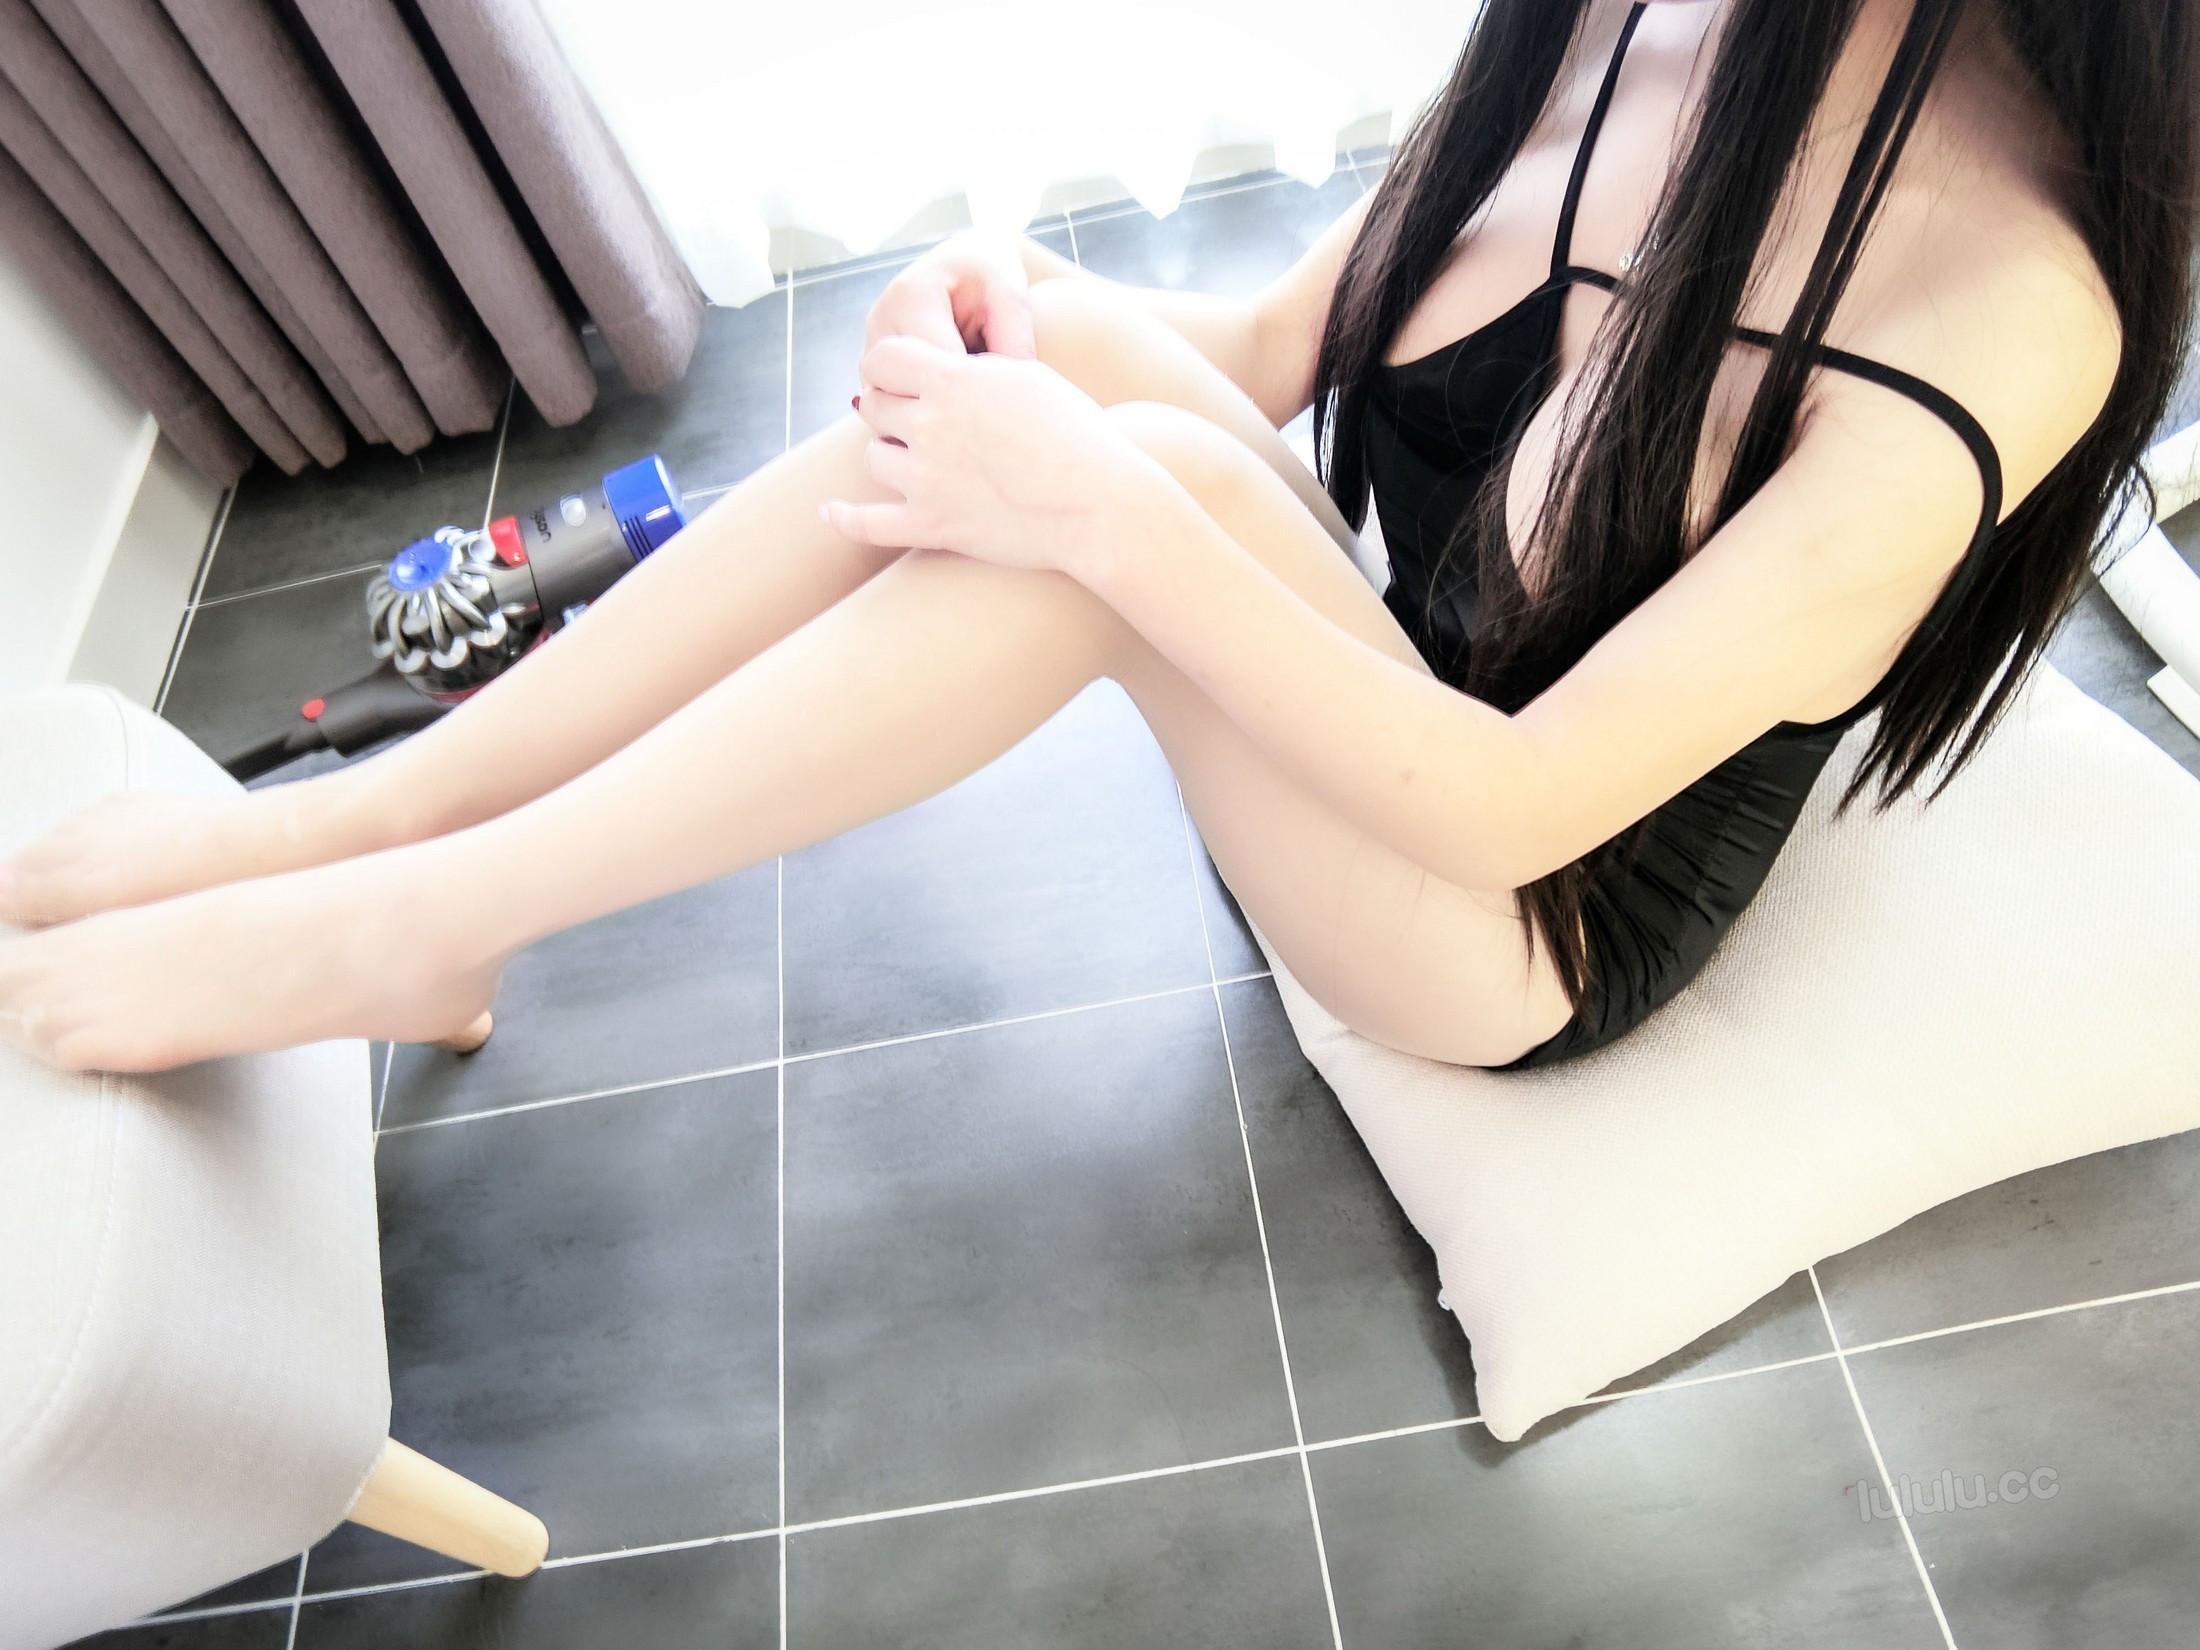 [cosplay] MaSusu - Sexy black skirt cleaning 020